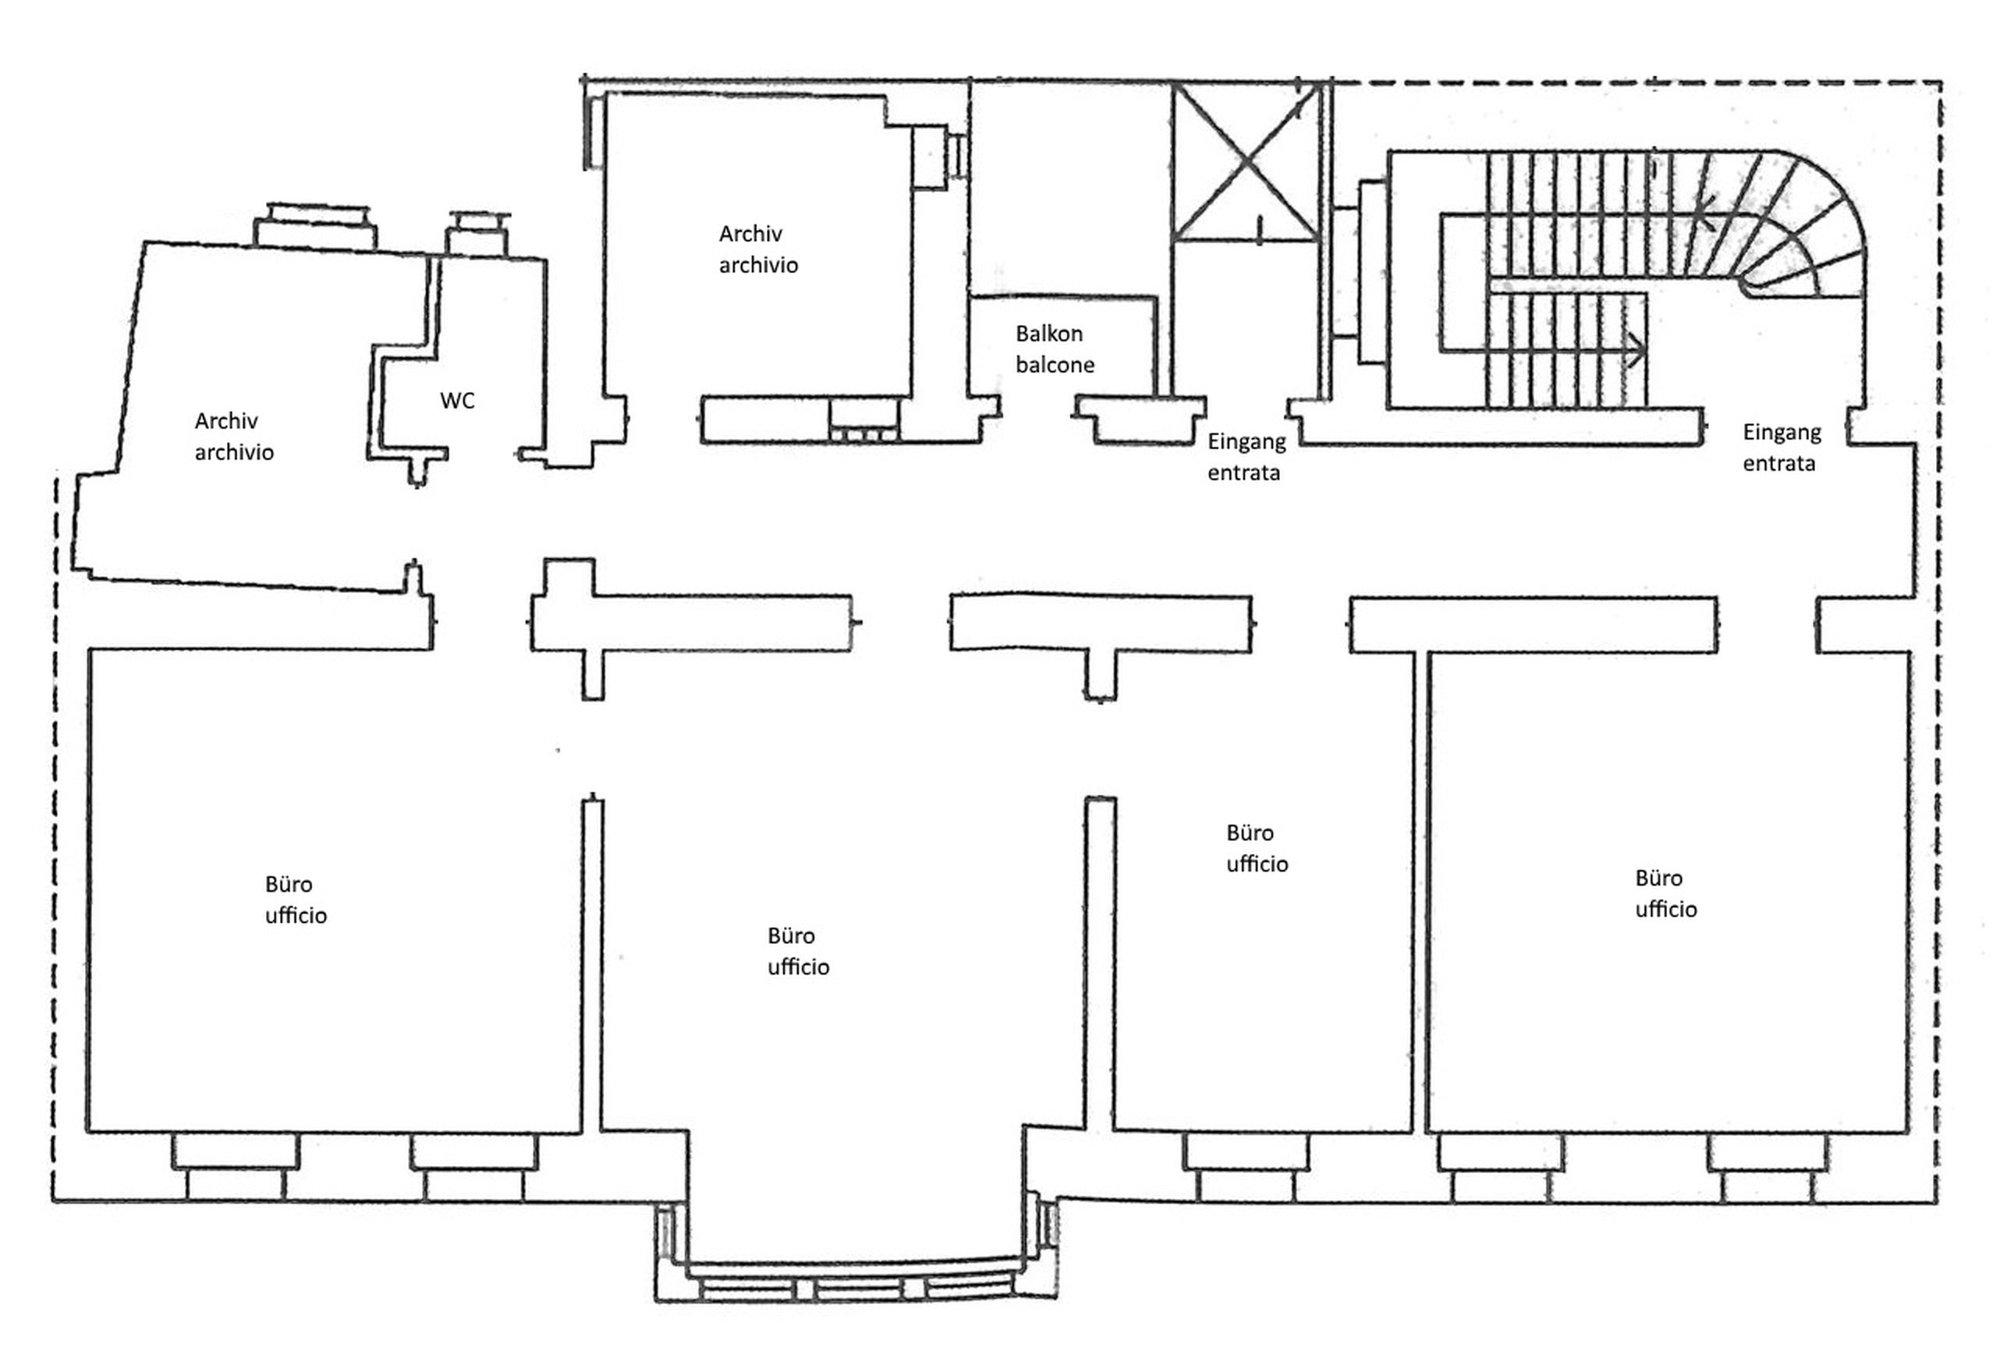 Plan Büroeinheit_piantina unità ufficio